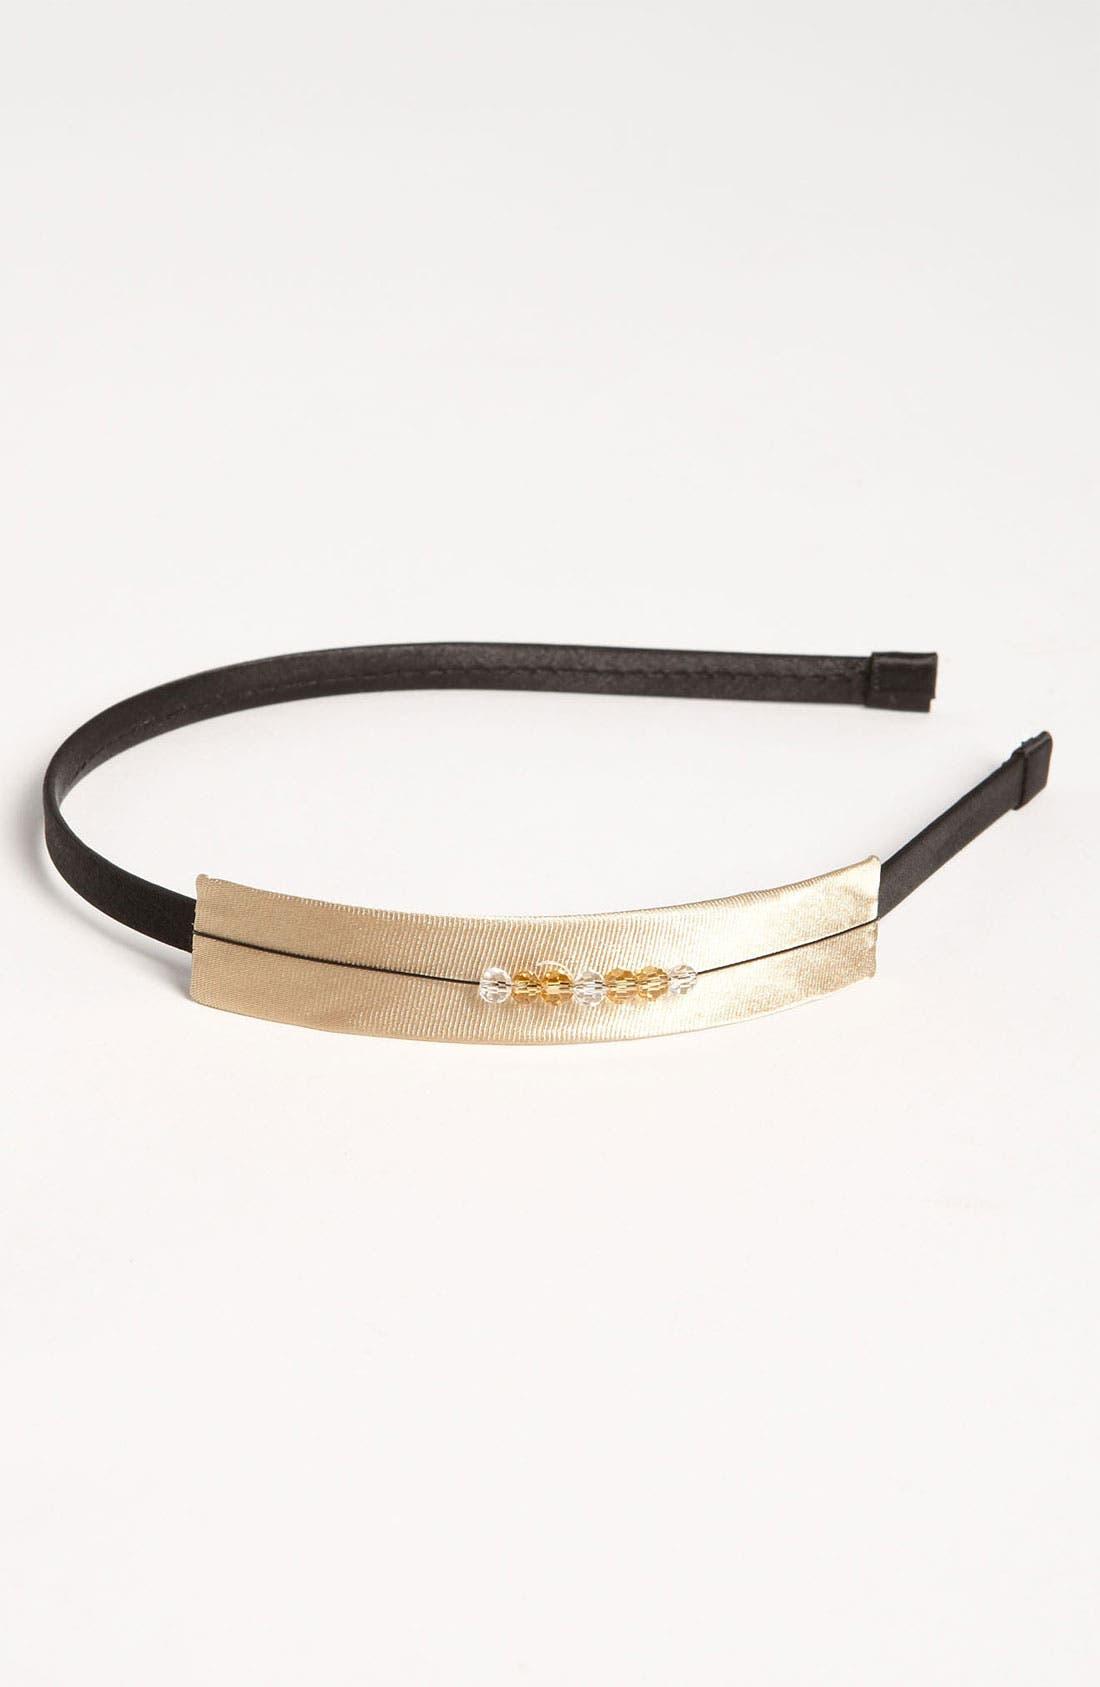 Main Image - Tasha 'Color Swatch' Headband